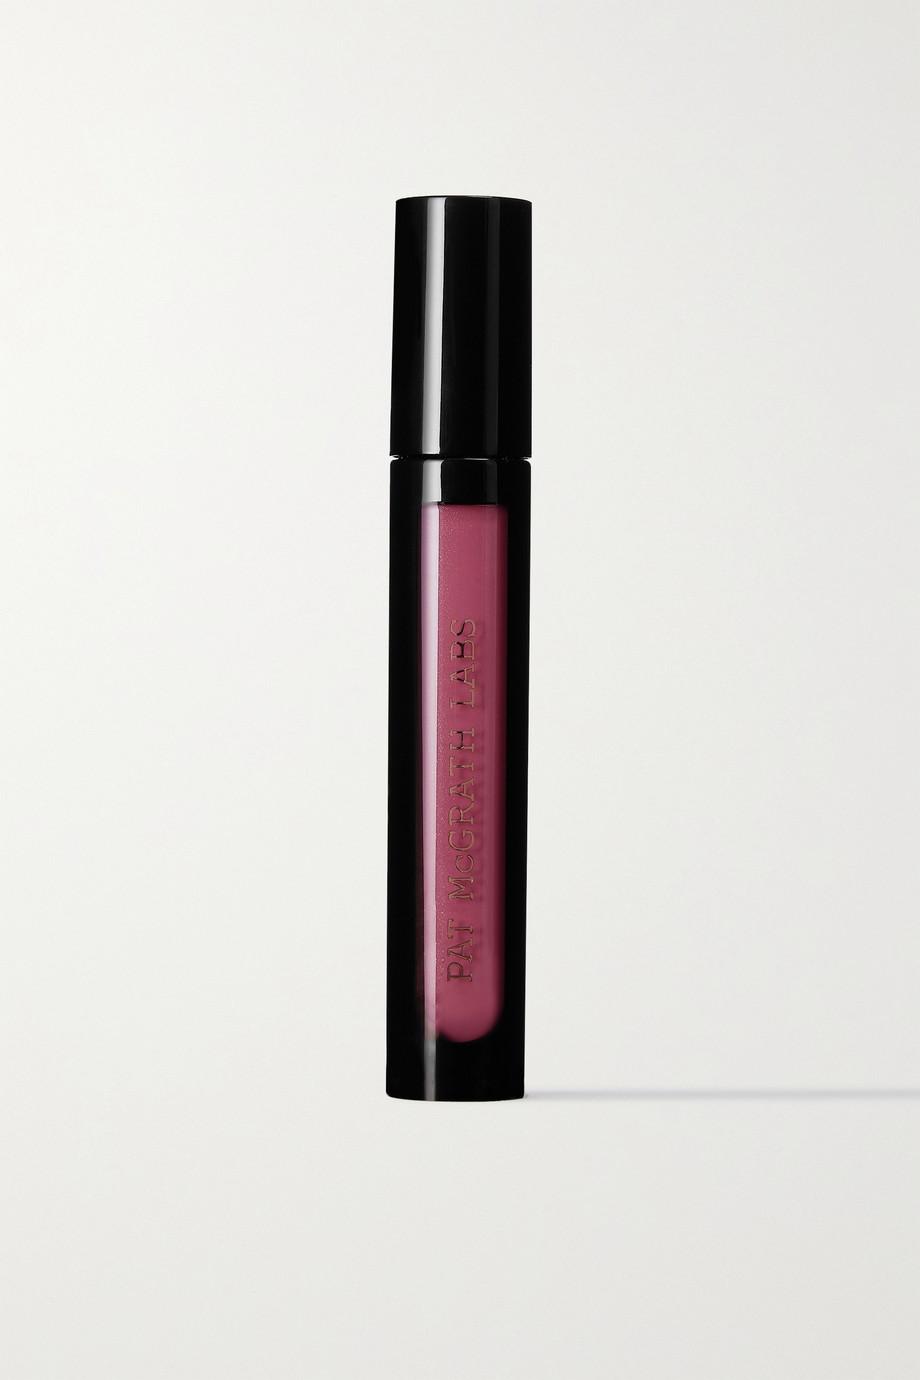 Pat McGrath Labs LiquiLUST: Legendary Wear Matte Lipstick - Wild Orchid